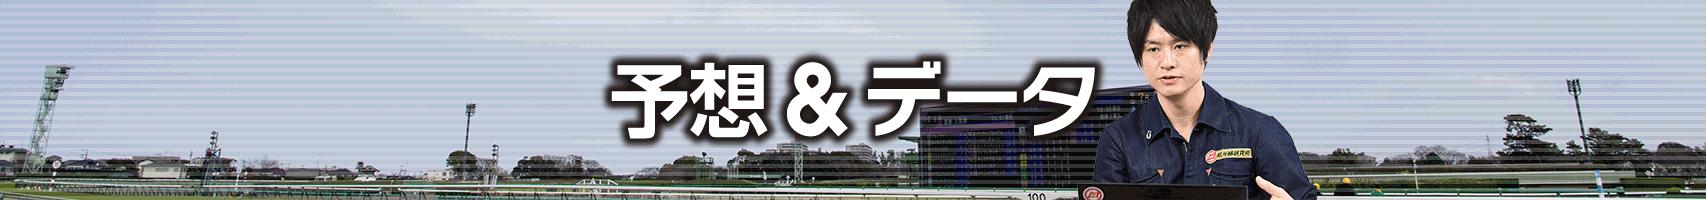 YouTubeチャンネル『亀谷敬正の競馬血統辞典』 買いパターン&消しパターン該当馬/8月9日(日)